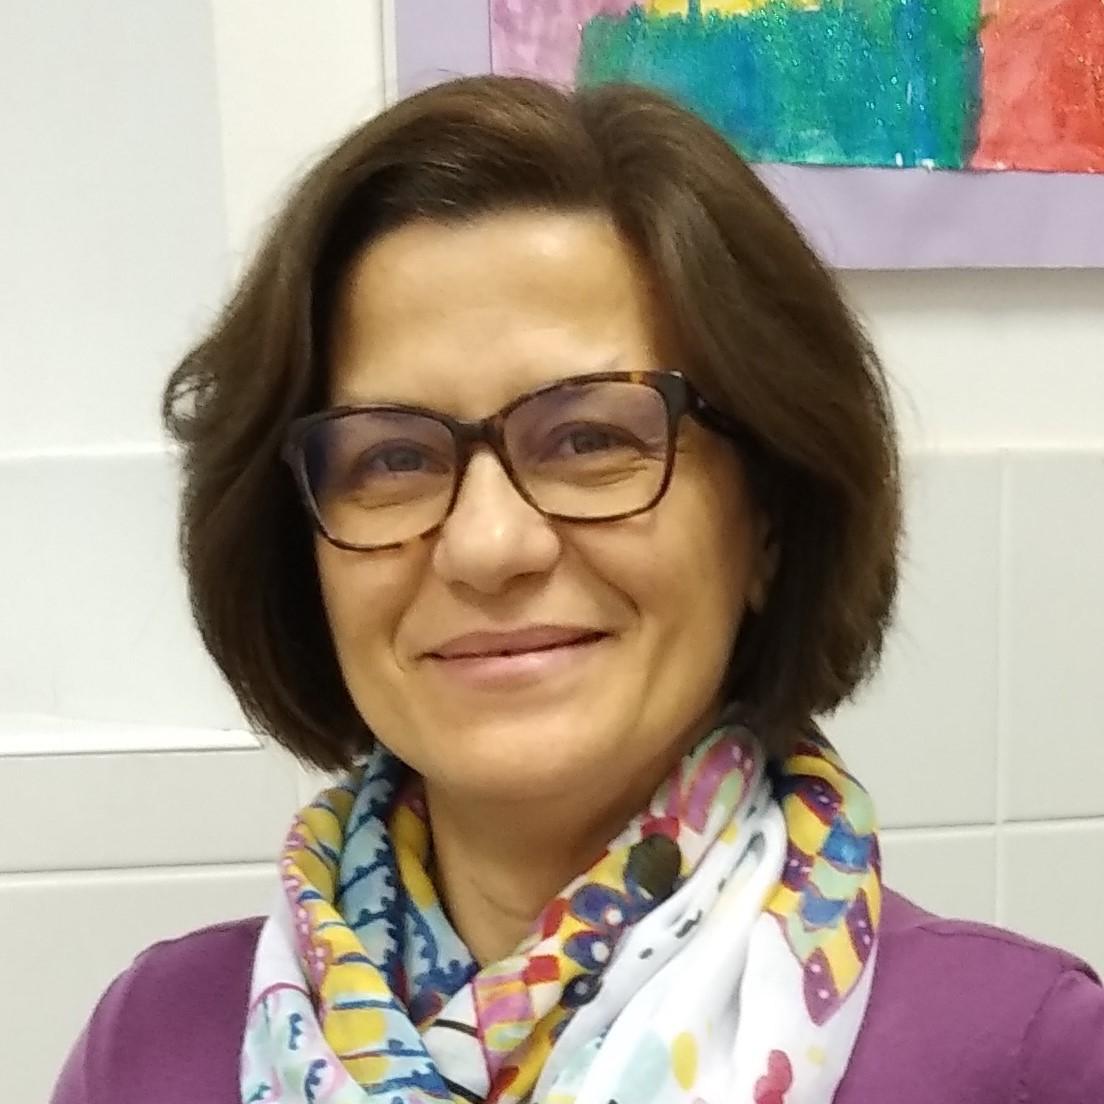 prof. dr. sc. Mirela Planinić